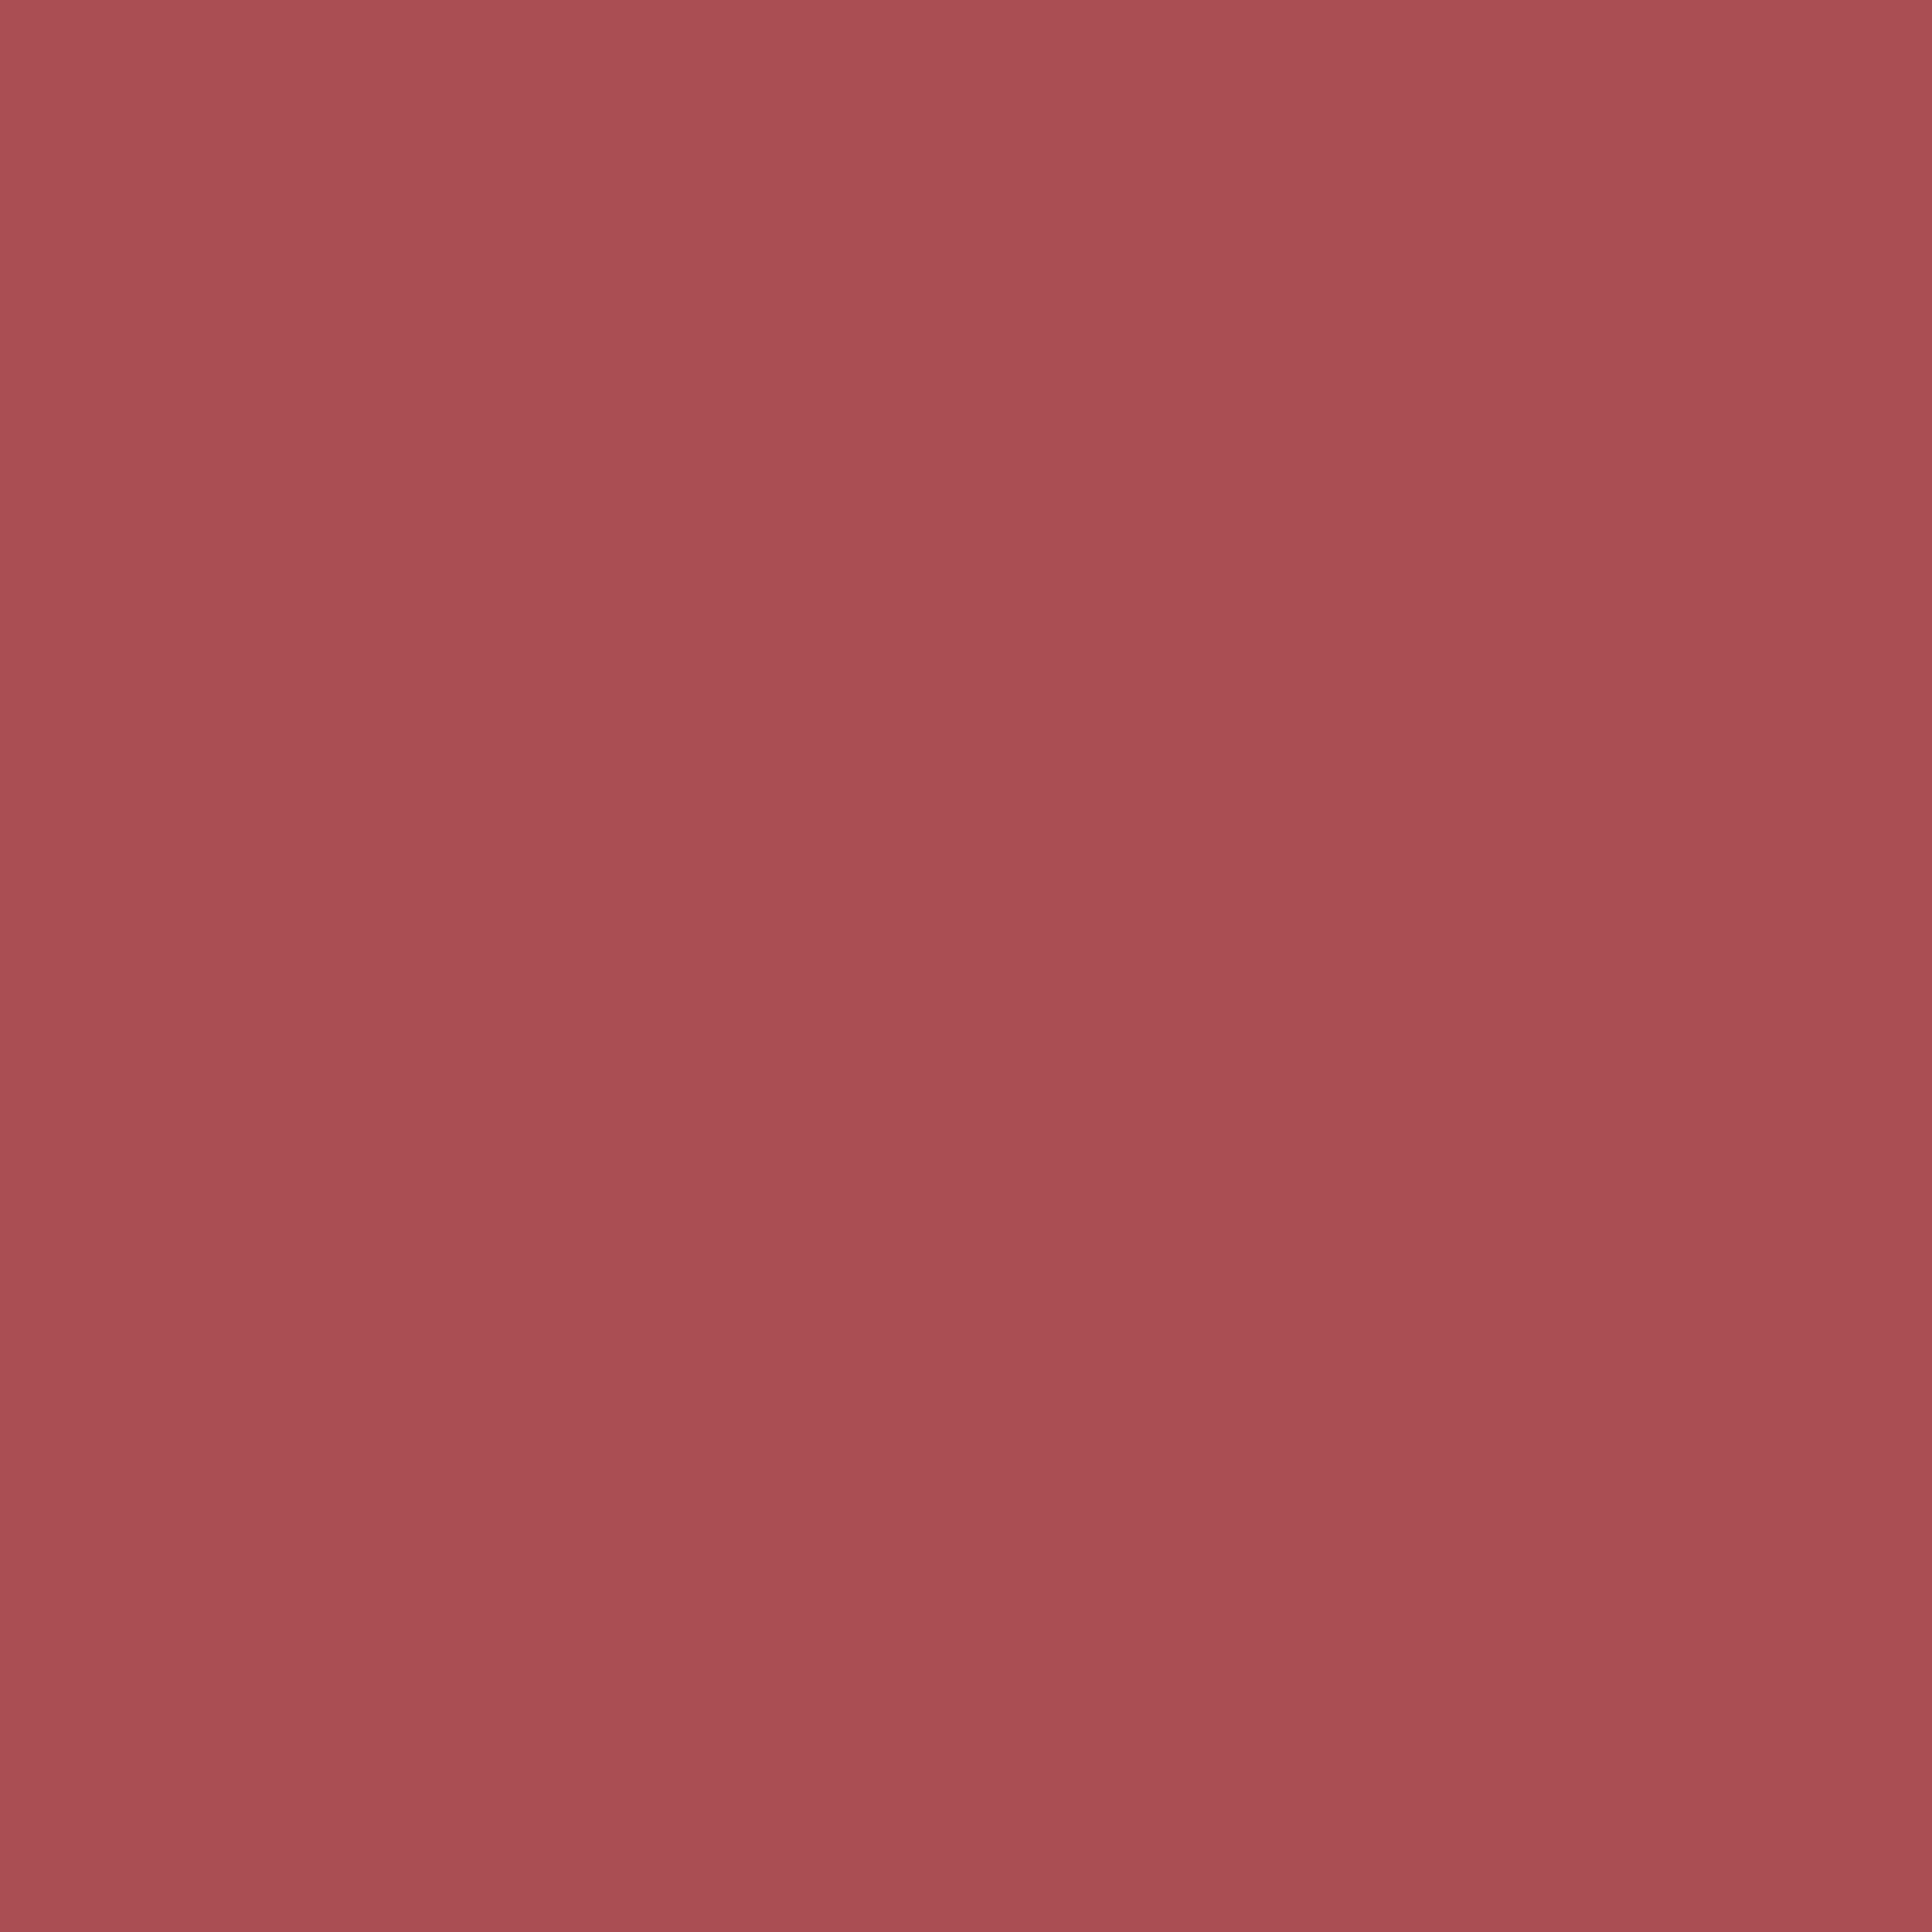 2732x2732 Rose Vale Solid Color Background